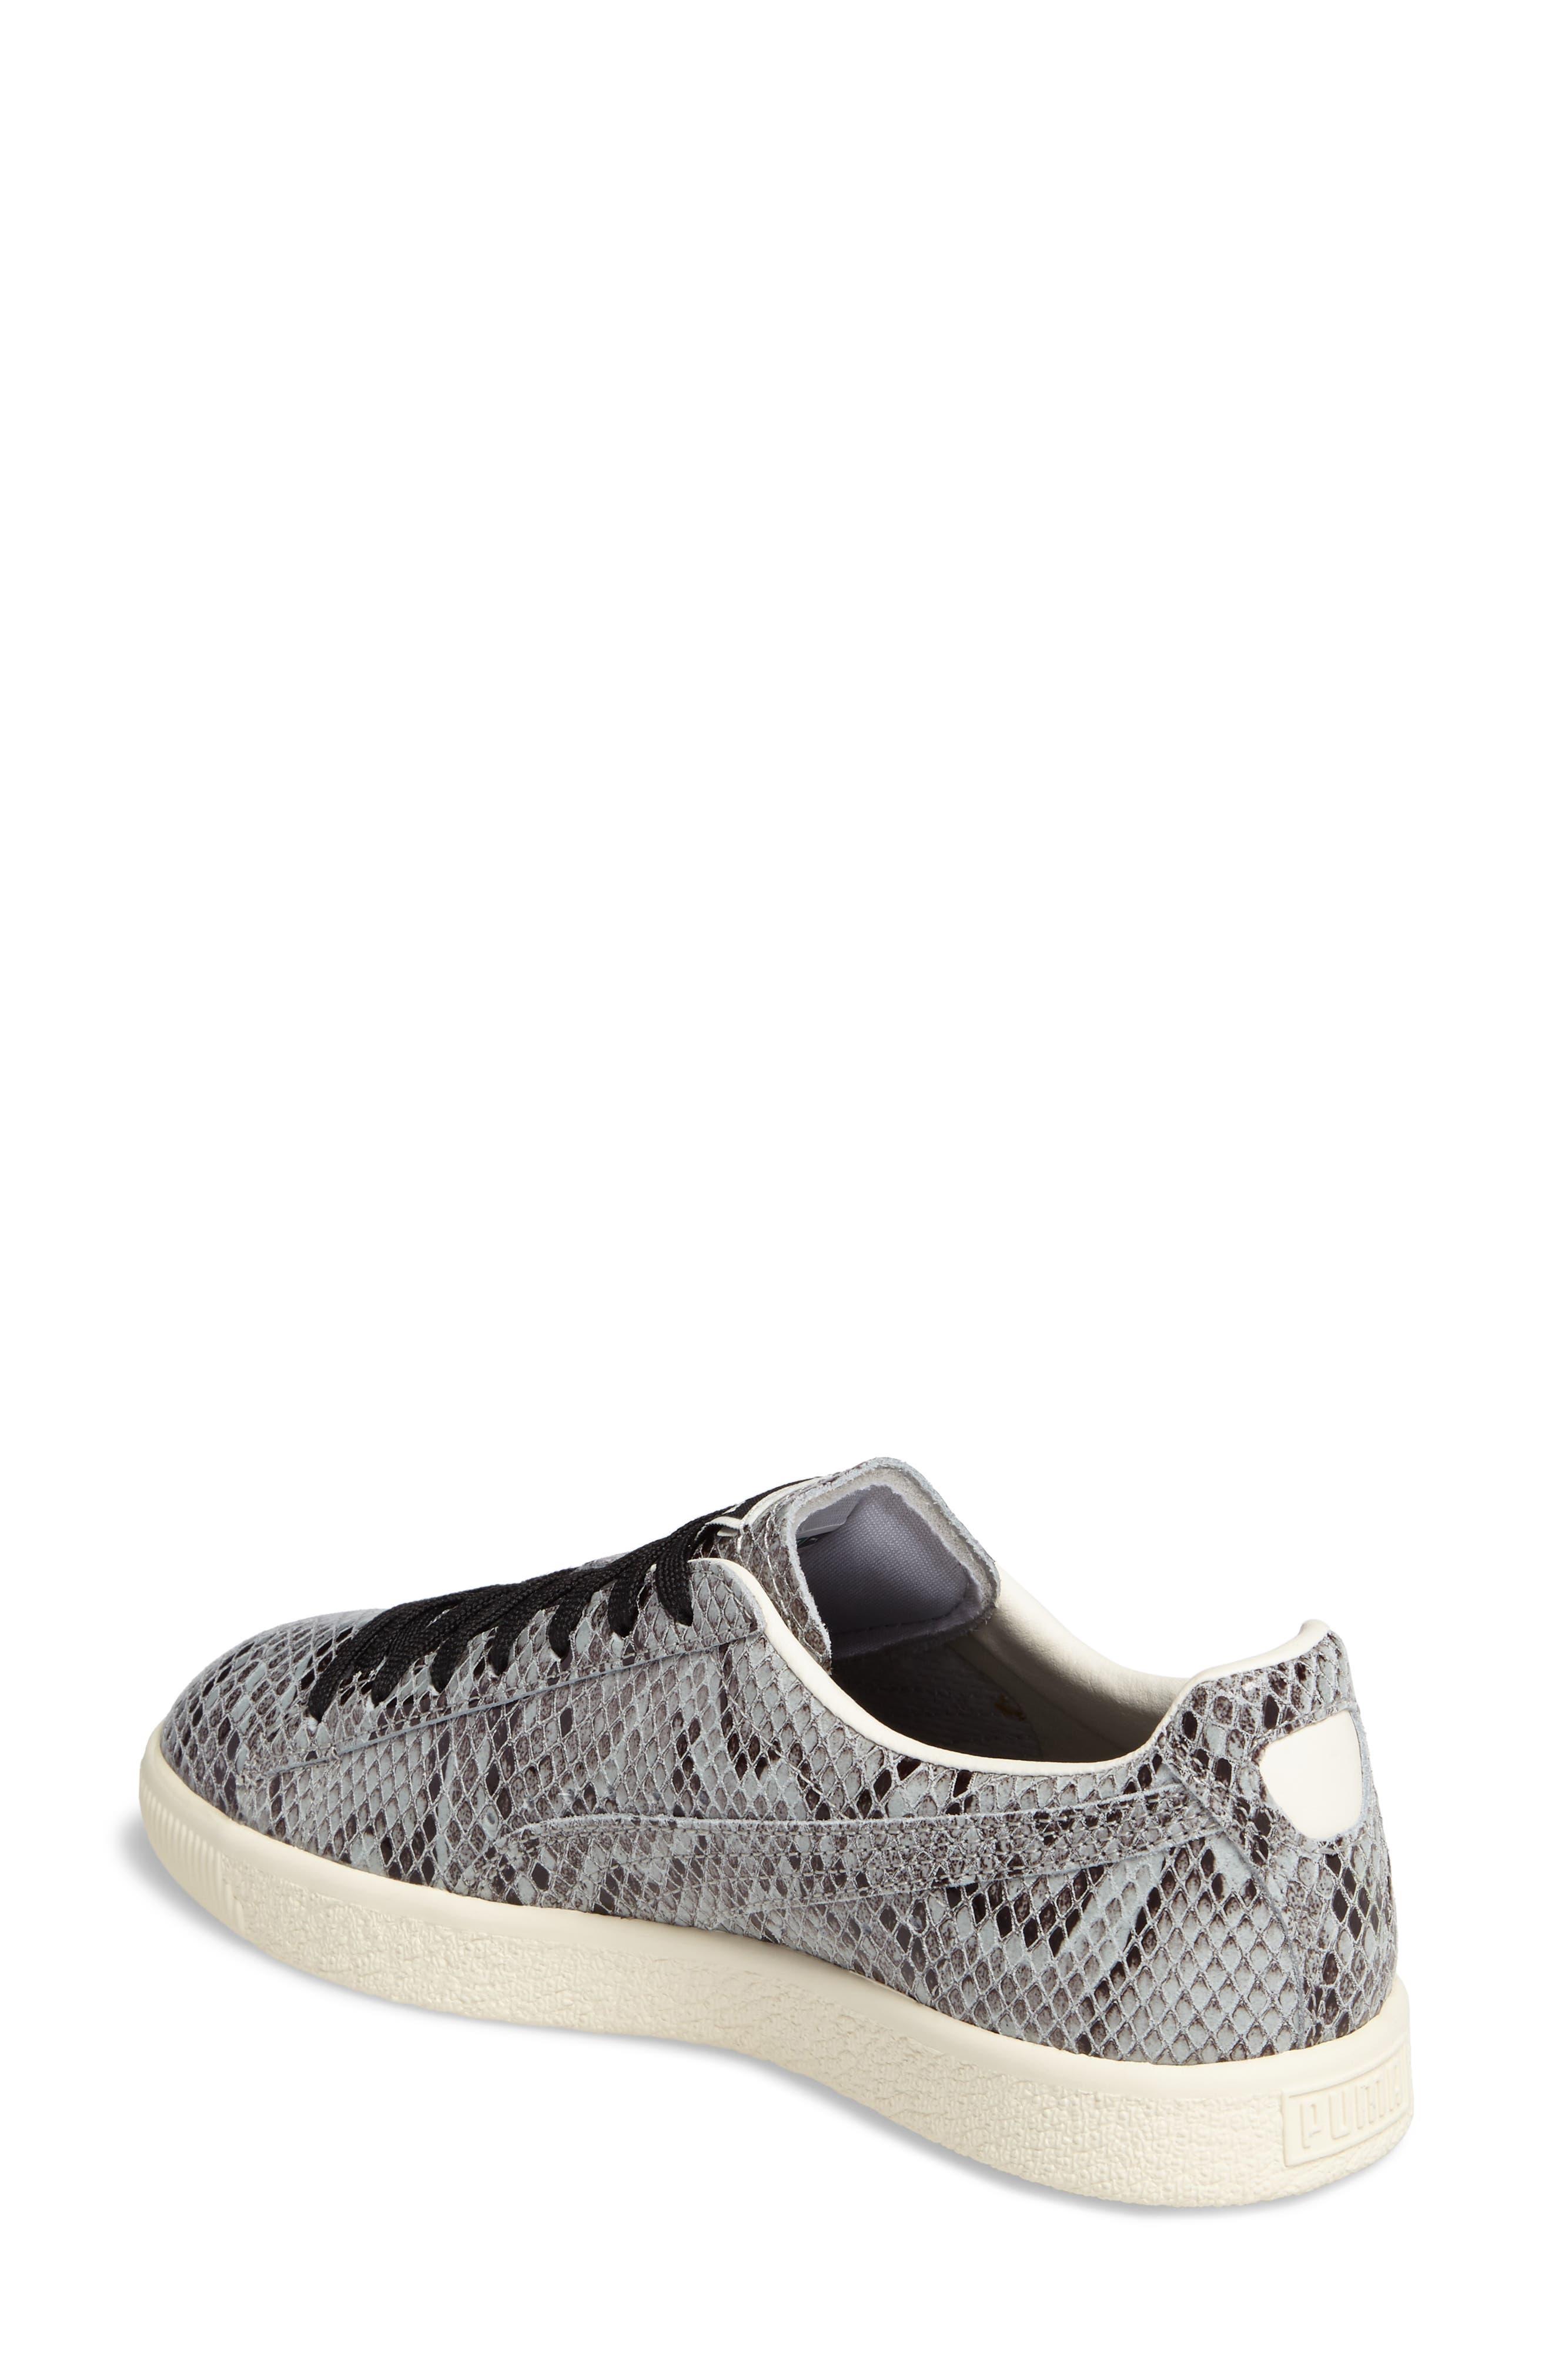 Clyde Sneaker,                             Alternate thumbnail 2, color,                             Puma Silver